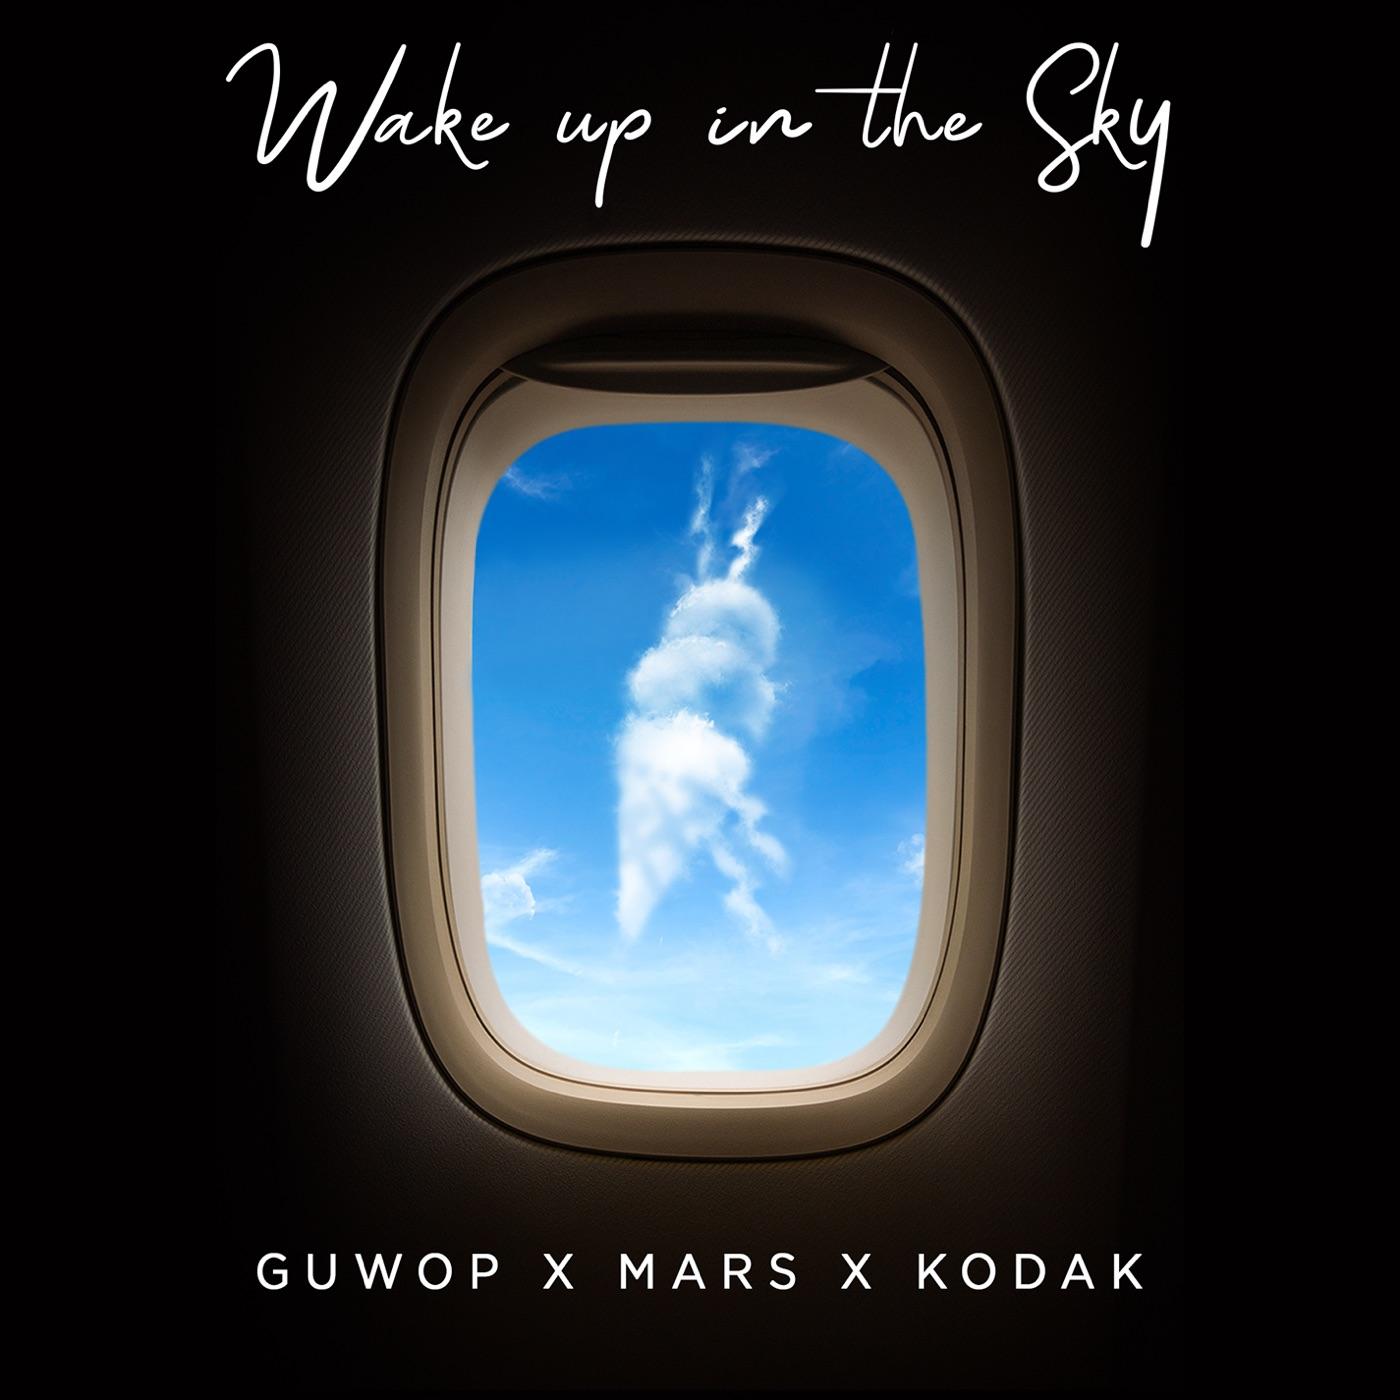 Wake Up In The Sky Gucci Mp3: Download: Gucci Mane, Bruno Mars & Kodak Black